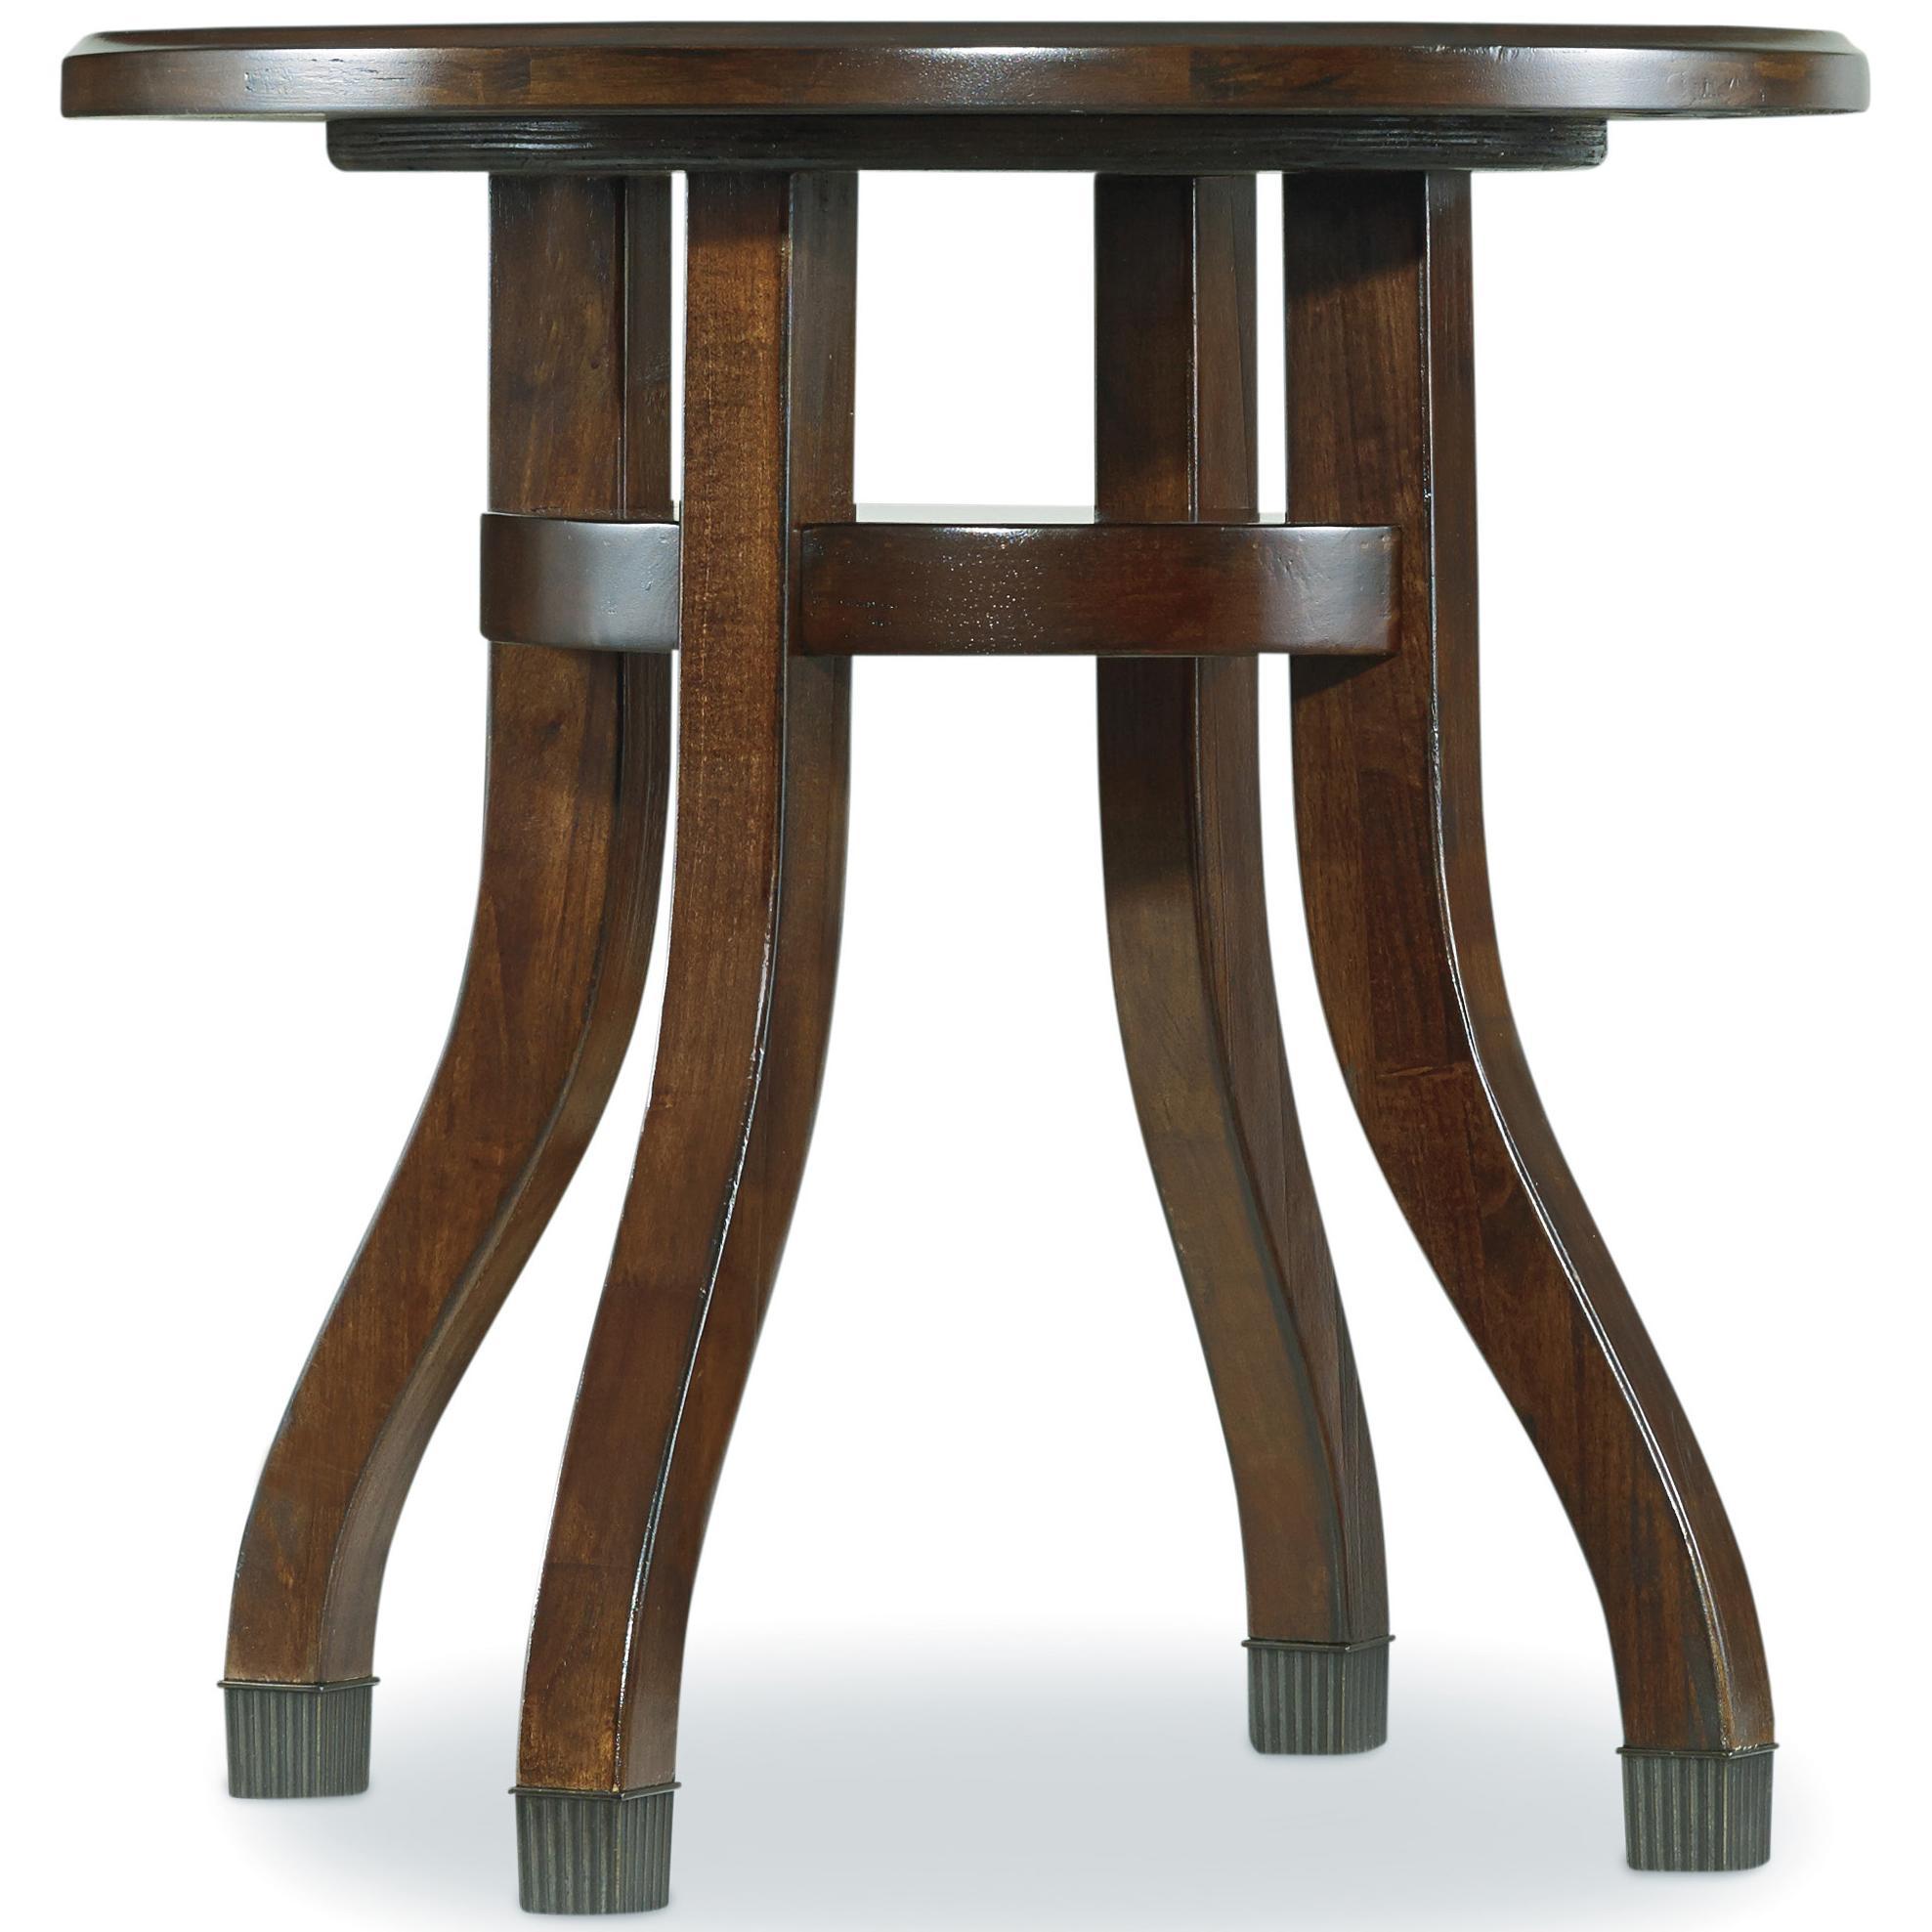 Hooker Furniture Palisade Round End Table - Item Number: 5183-80116